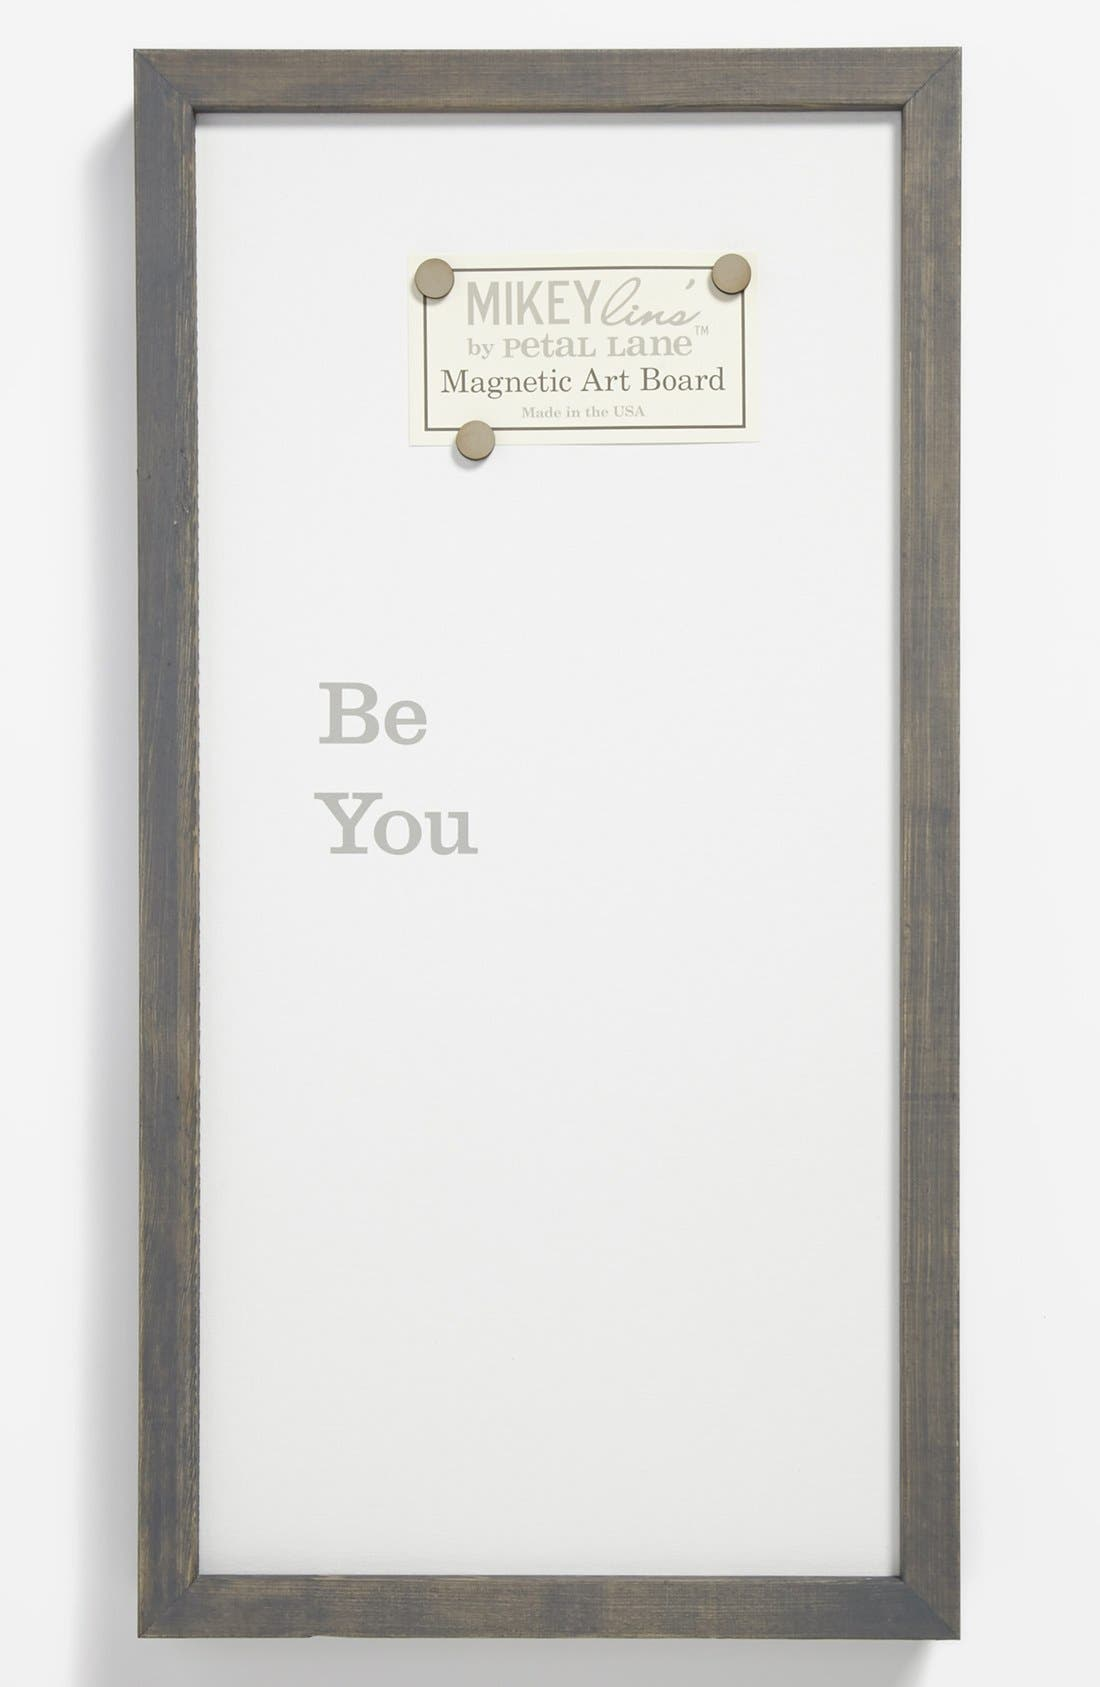 Main Image - 'Be You' Framed Magnet Board